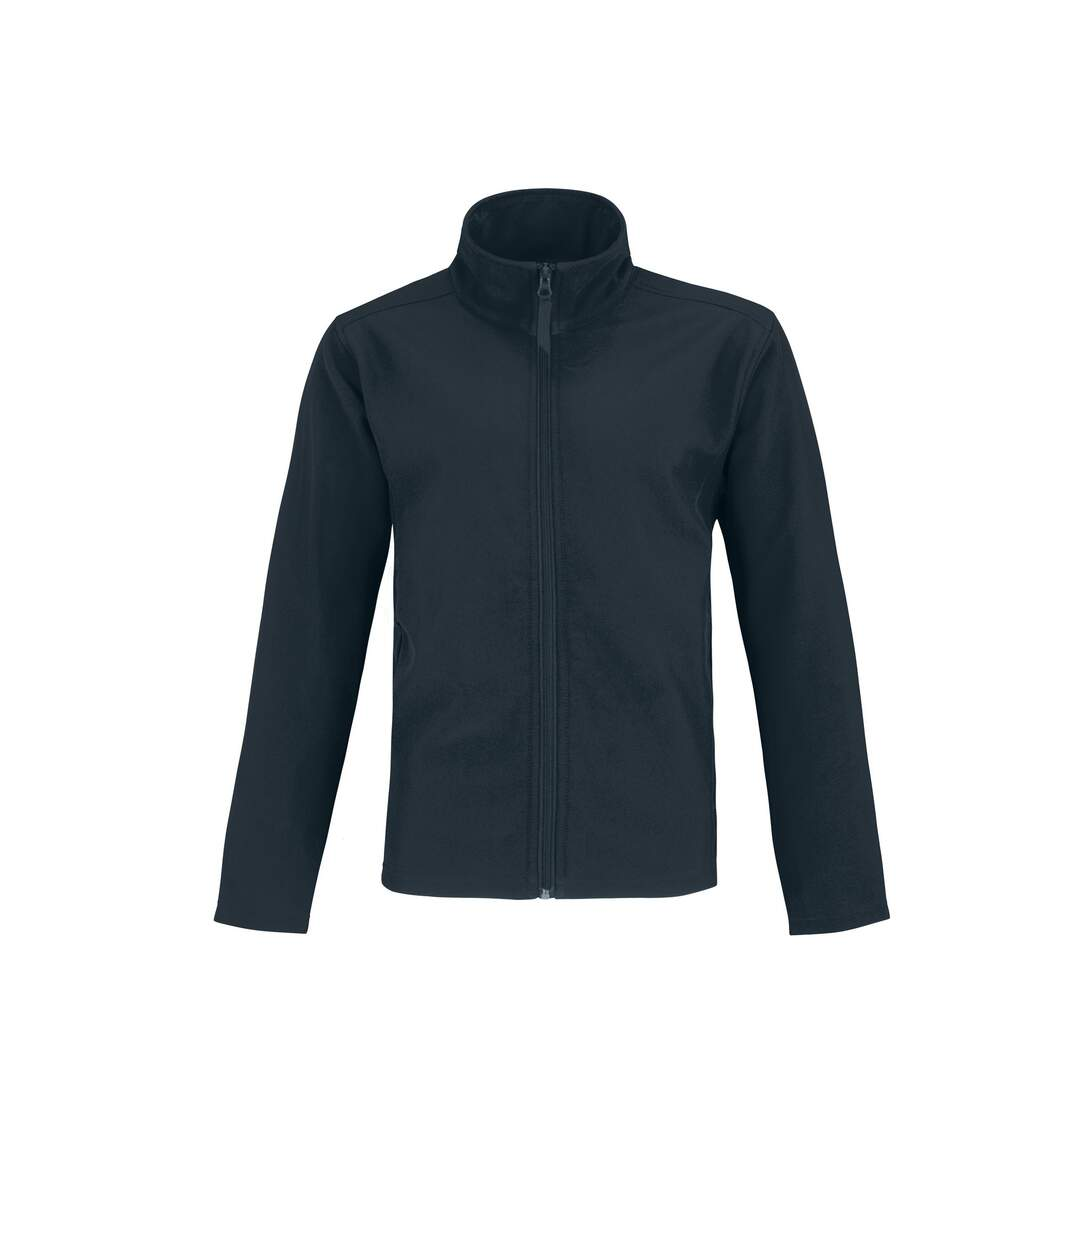 B&C Mens Two Layer Water Repellent Softshell Jacket (Navy/ Neon Green) - UTRW4835